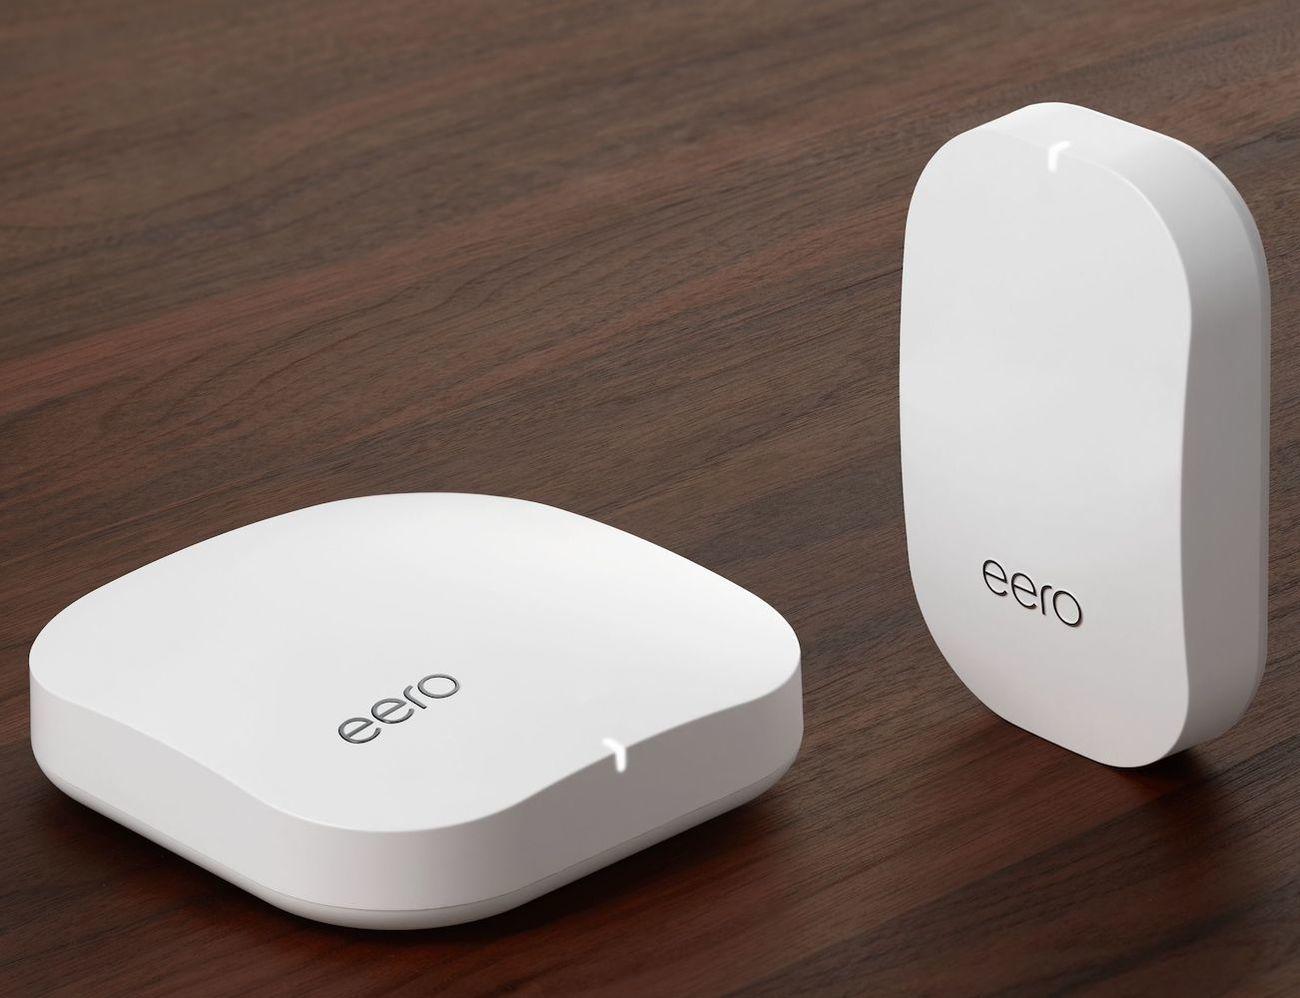 eero True Mesh Home Wi-Fi System